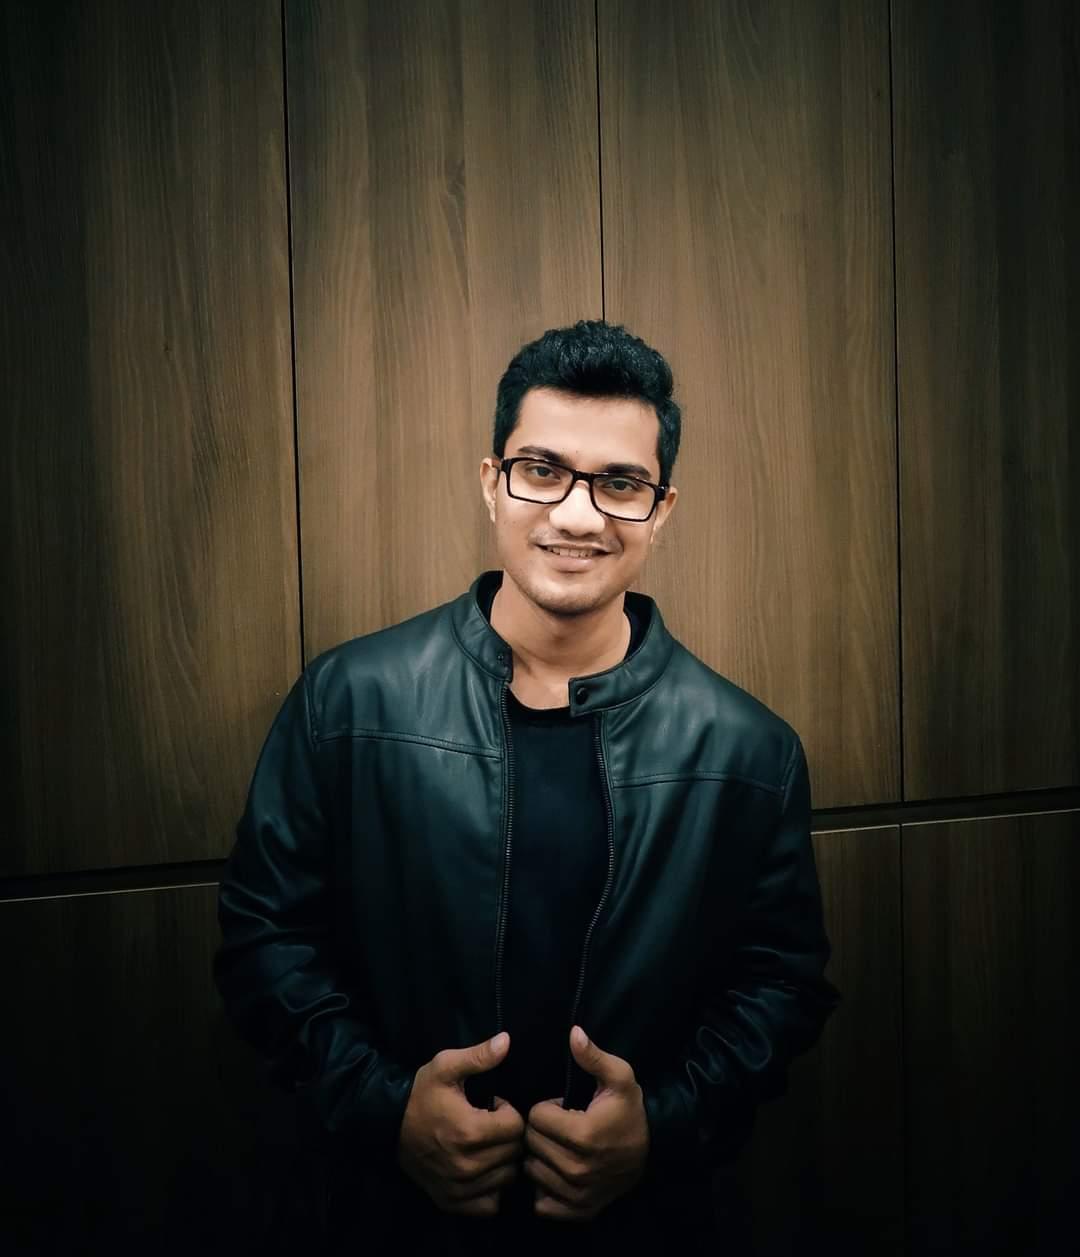 Sam - Atik Ahmed